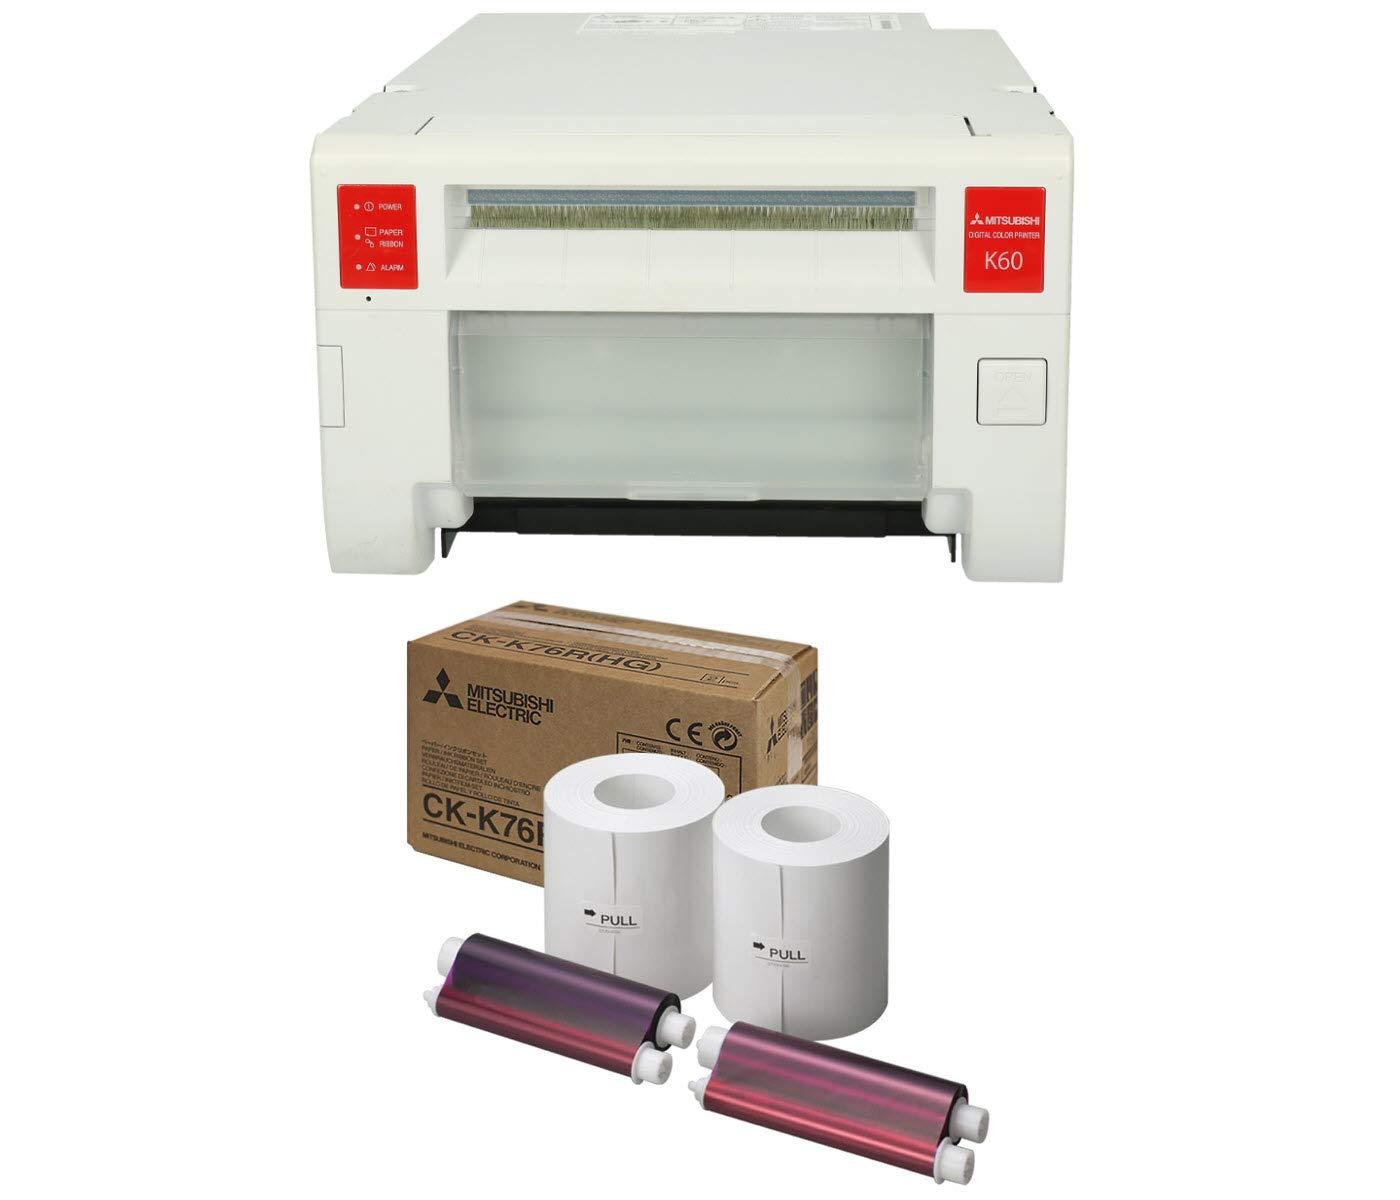 Mitsubishi CP-K60DW-S Compact Professional Event & Photo Booth Digital Dye-Sub Printer Bundle Print Media 6 inch Paper, 2 Rolls (CK-K76R-HG)